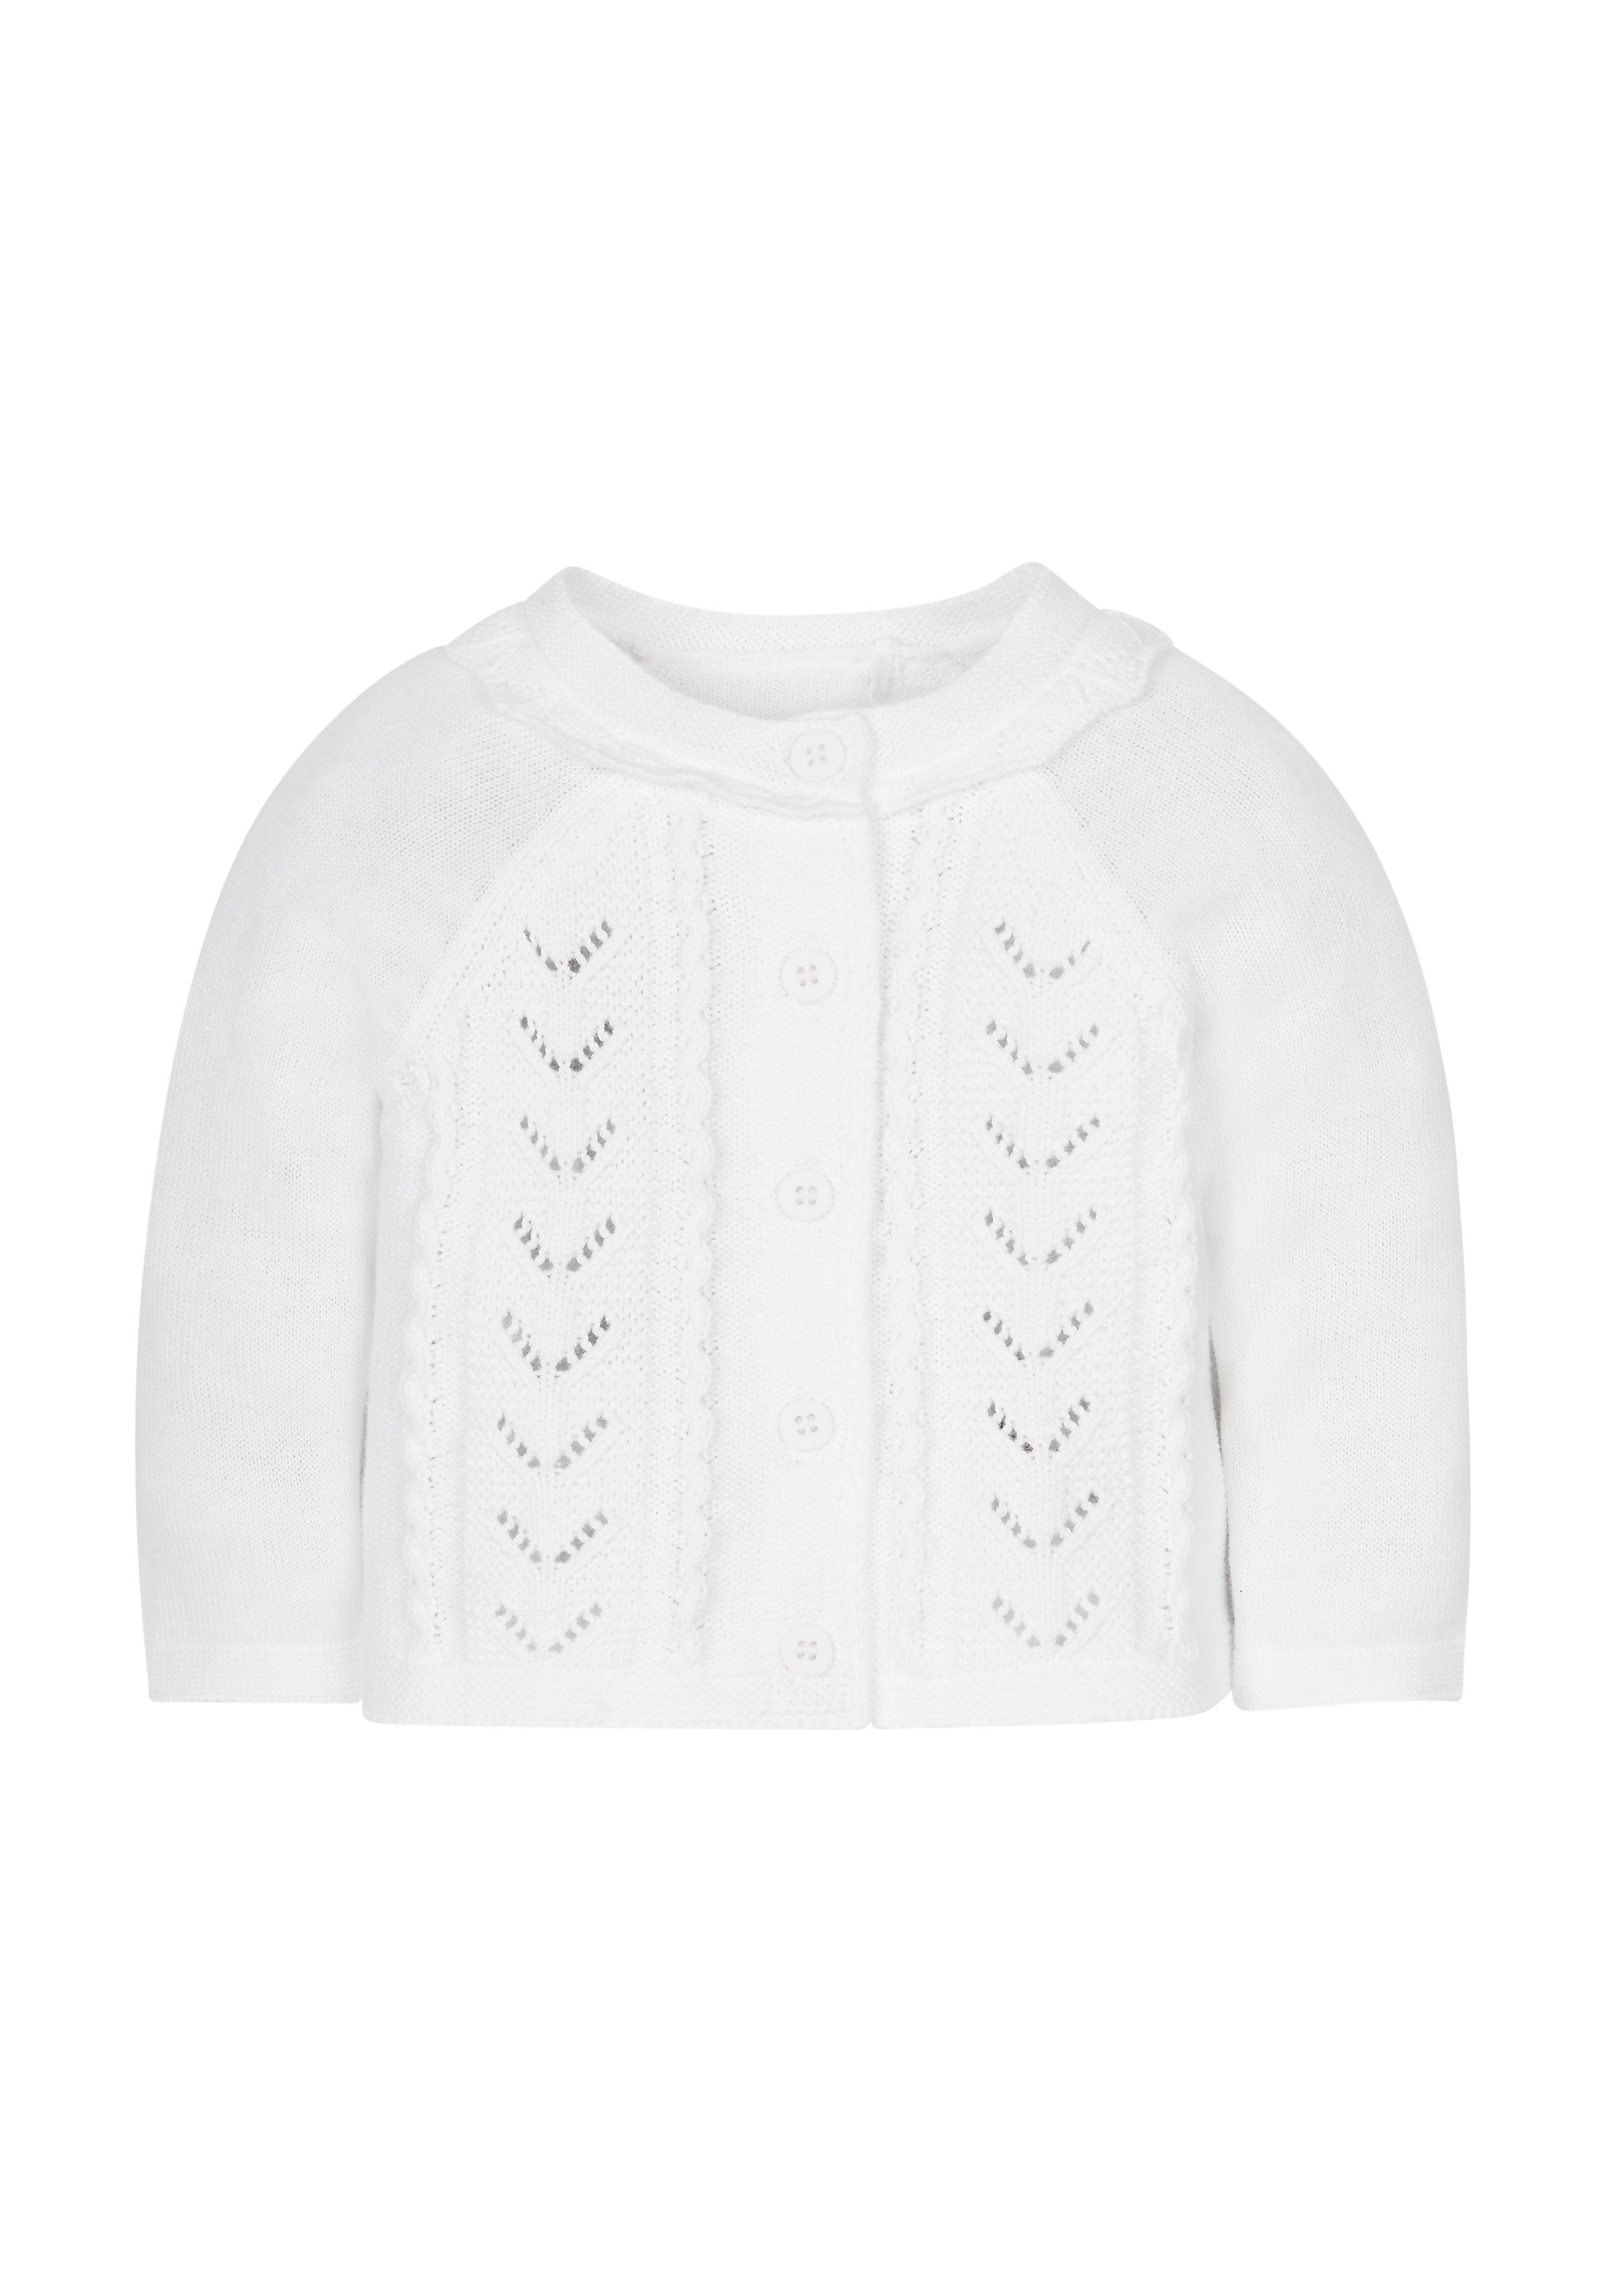 Mothercare | Girls Full Sleeves Cardigan - White